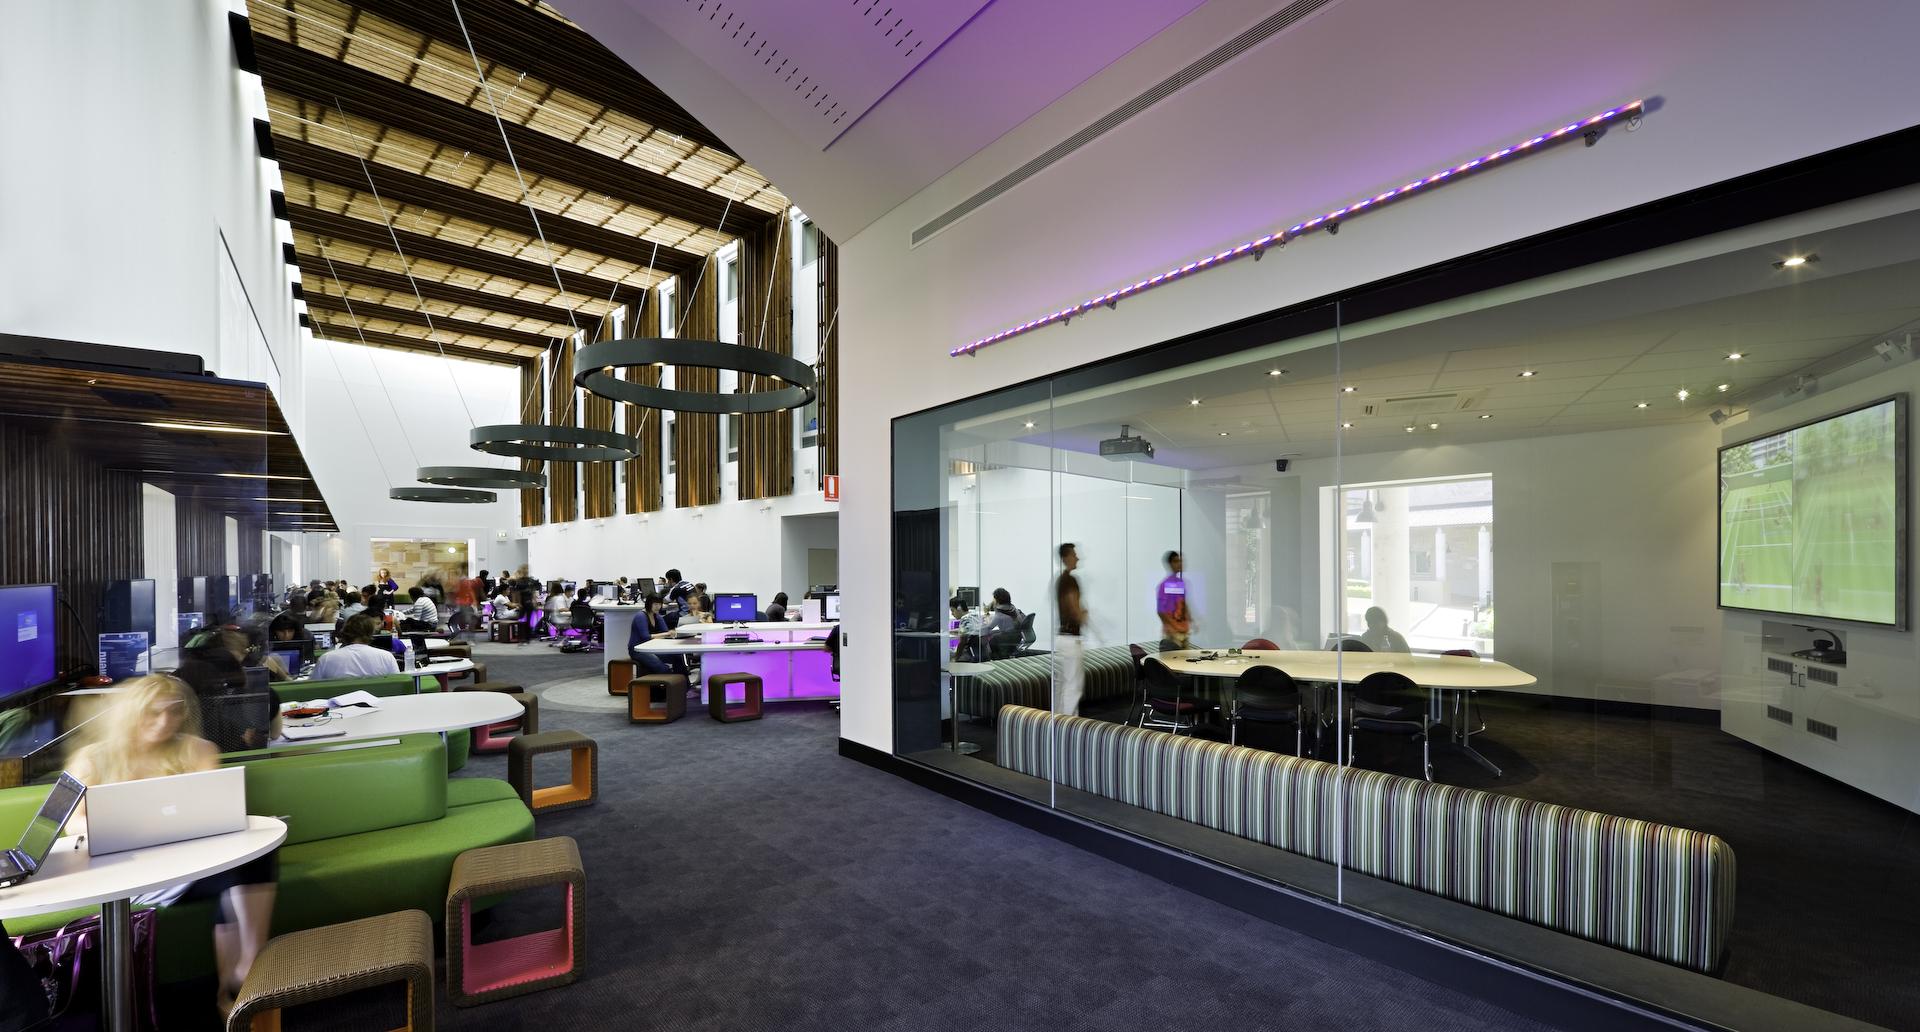 Social Learning Spaces; Bond University, Balnaves Multimedia Learning Centre